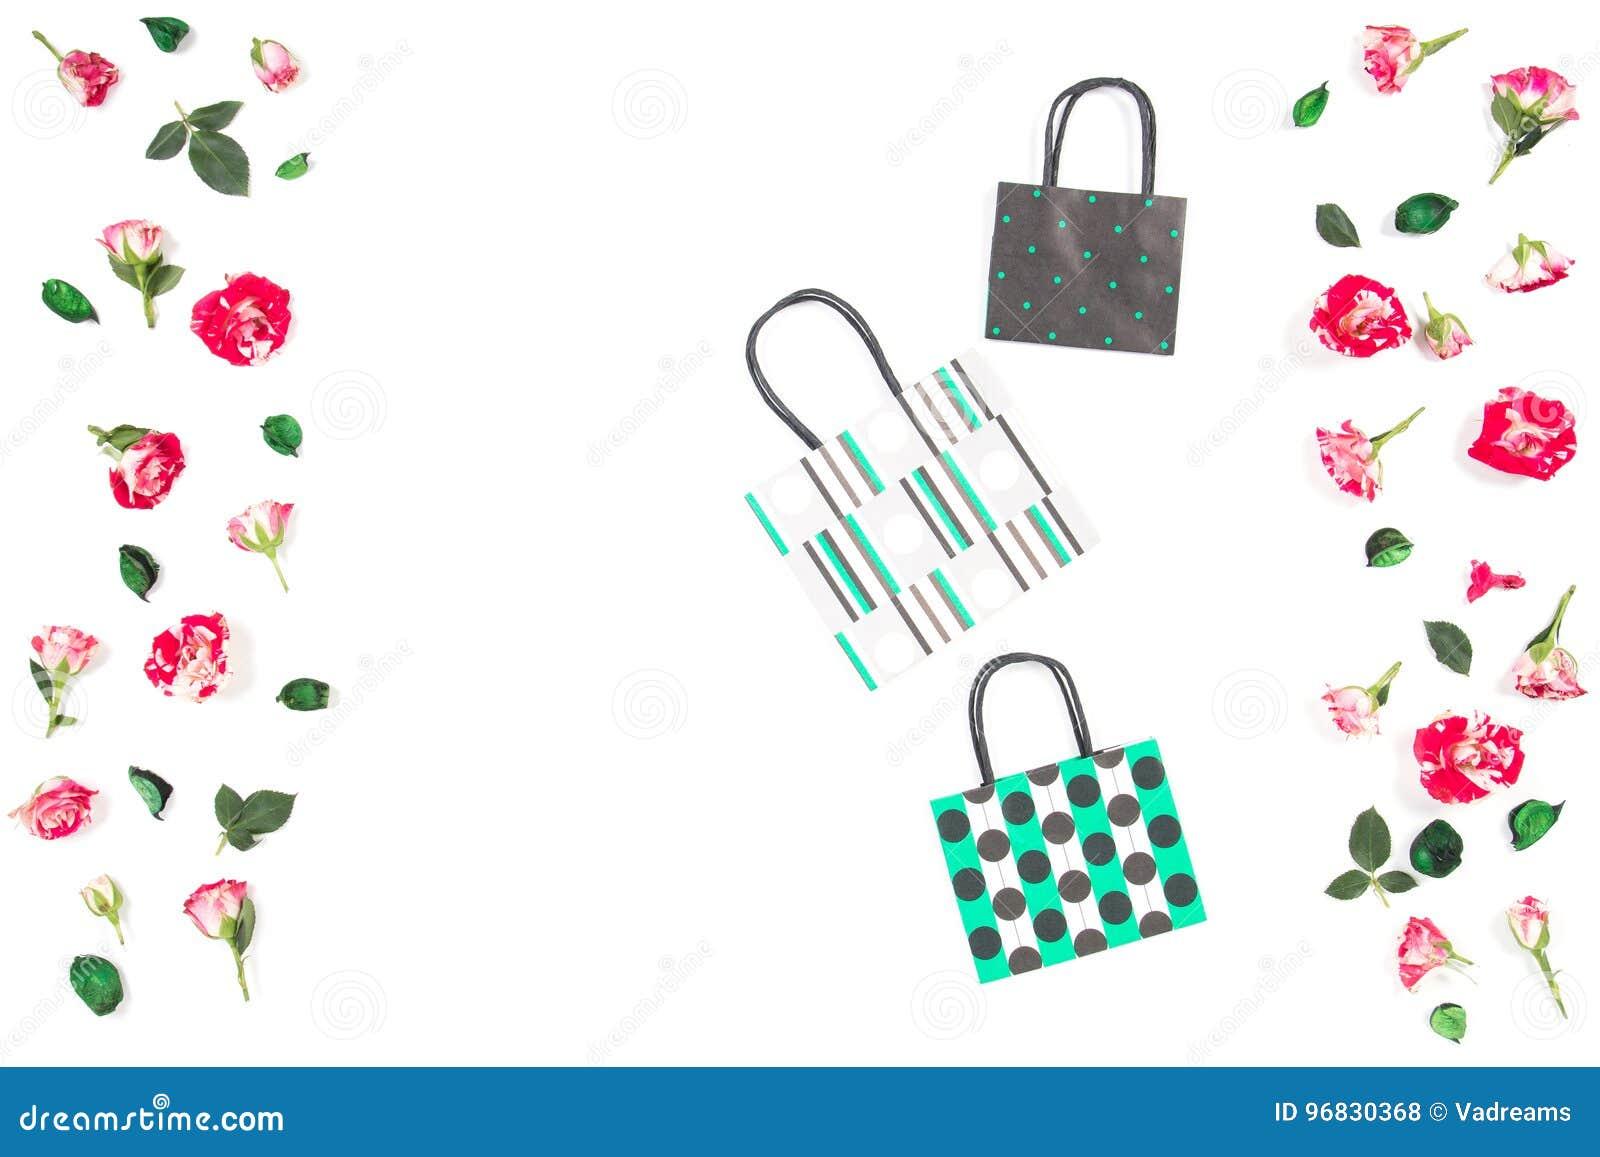 6ee4703f2c Τρεις ζωηρόχρωμες τσάντες αγορών εγγράφου και αυξήθηκαν πλαίσιο λουλουδιών  στο άσπρο υπόβαθρο Τοπ όψη